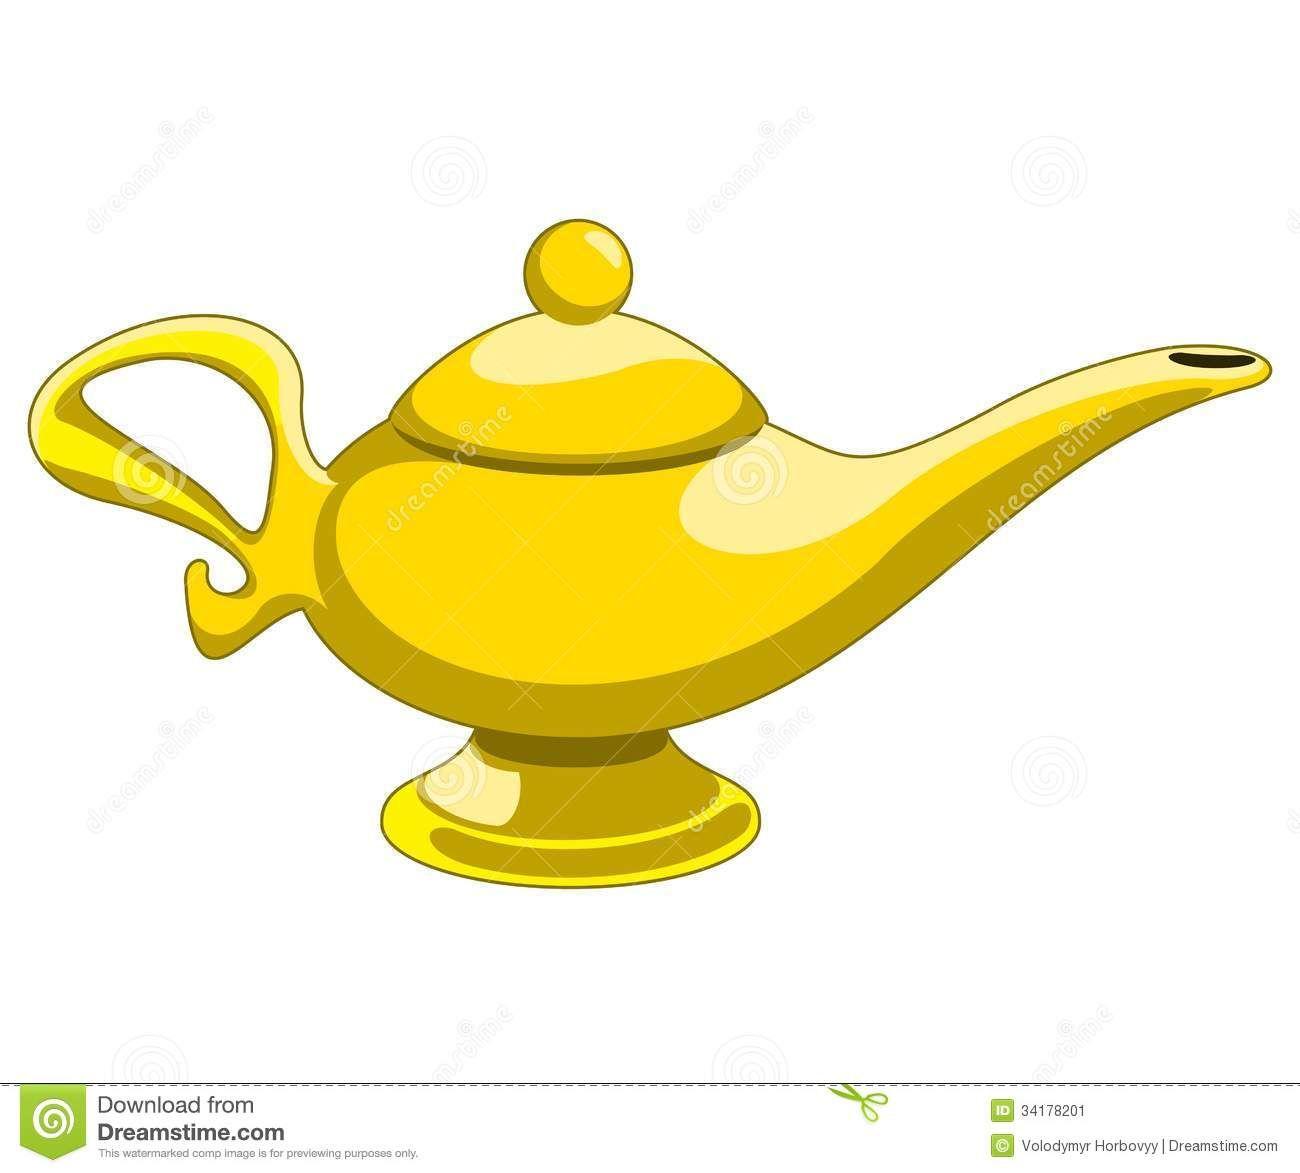 Http Thumbs Dreamstime Com Z Aladdin S Lamp Doodle Style Genie Vector Illustration 34178201 Jpg Magic Lamp Aladdin Lamp Genie Lamp